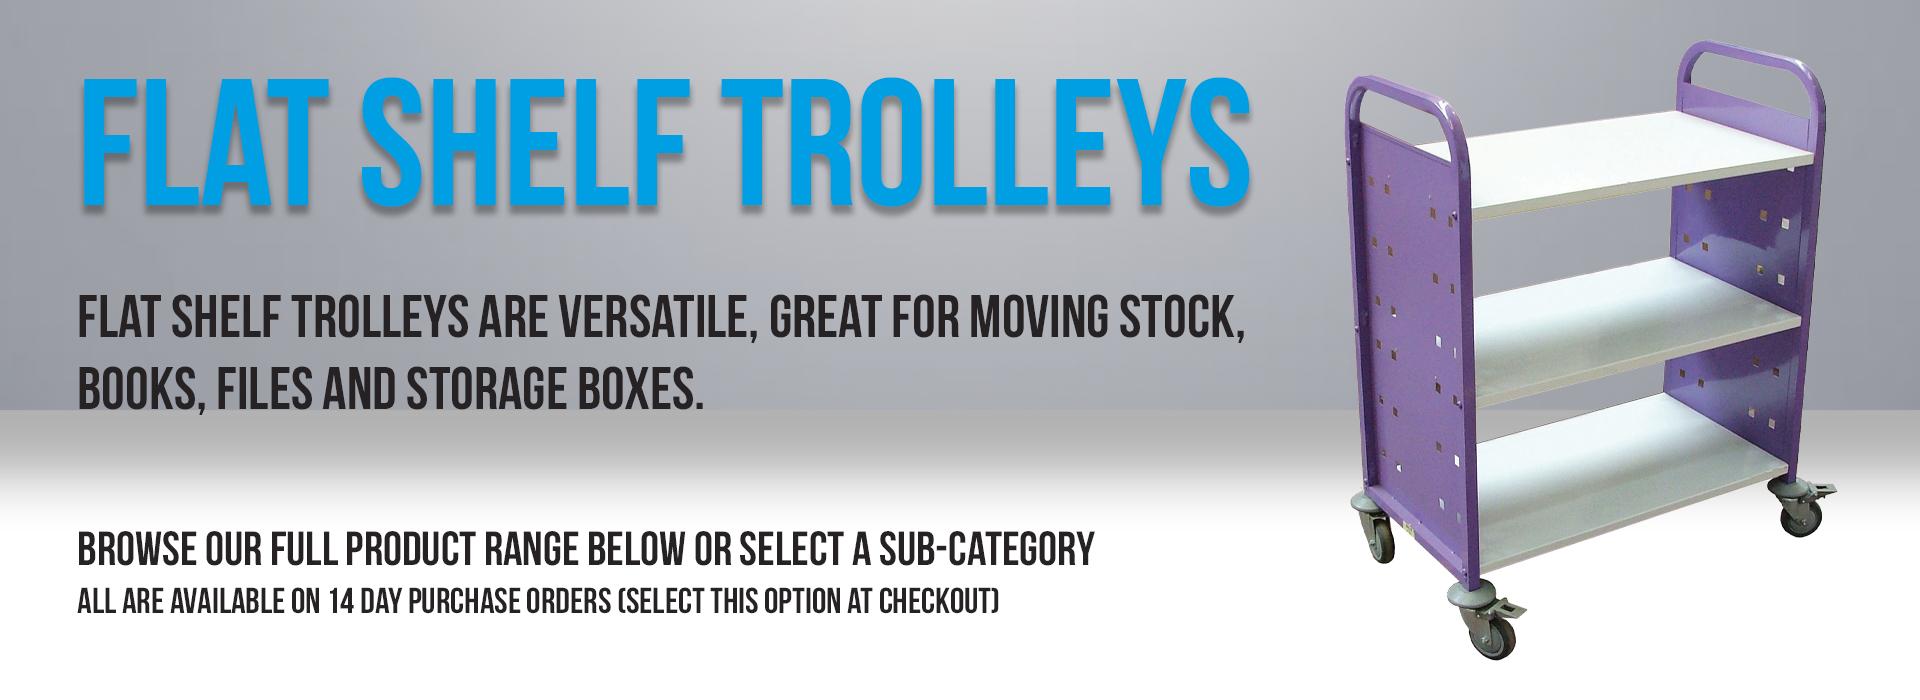 flat-shelf-trolleys-banner.jpg